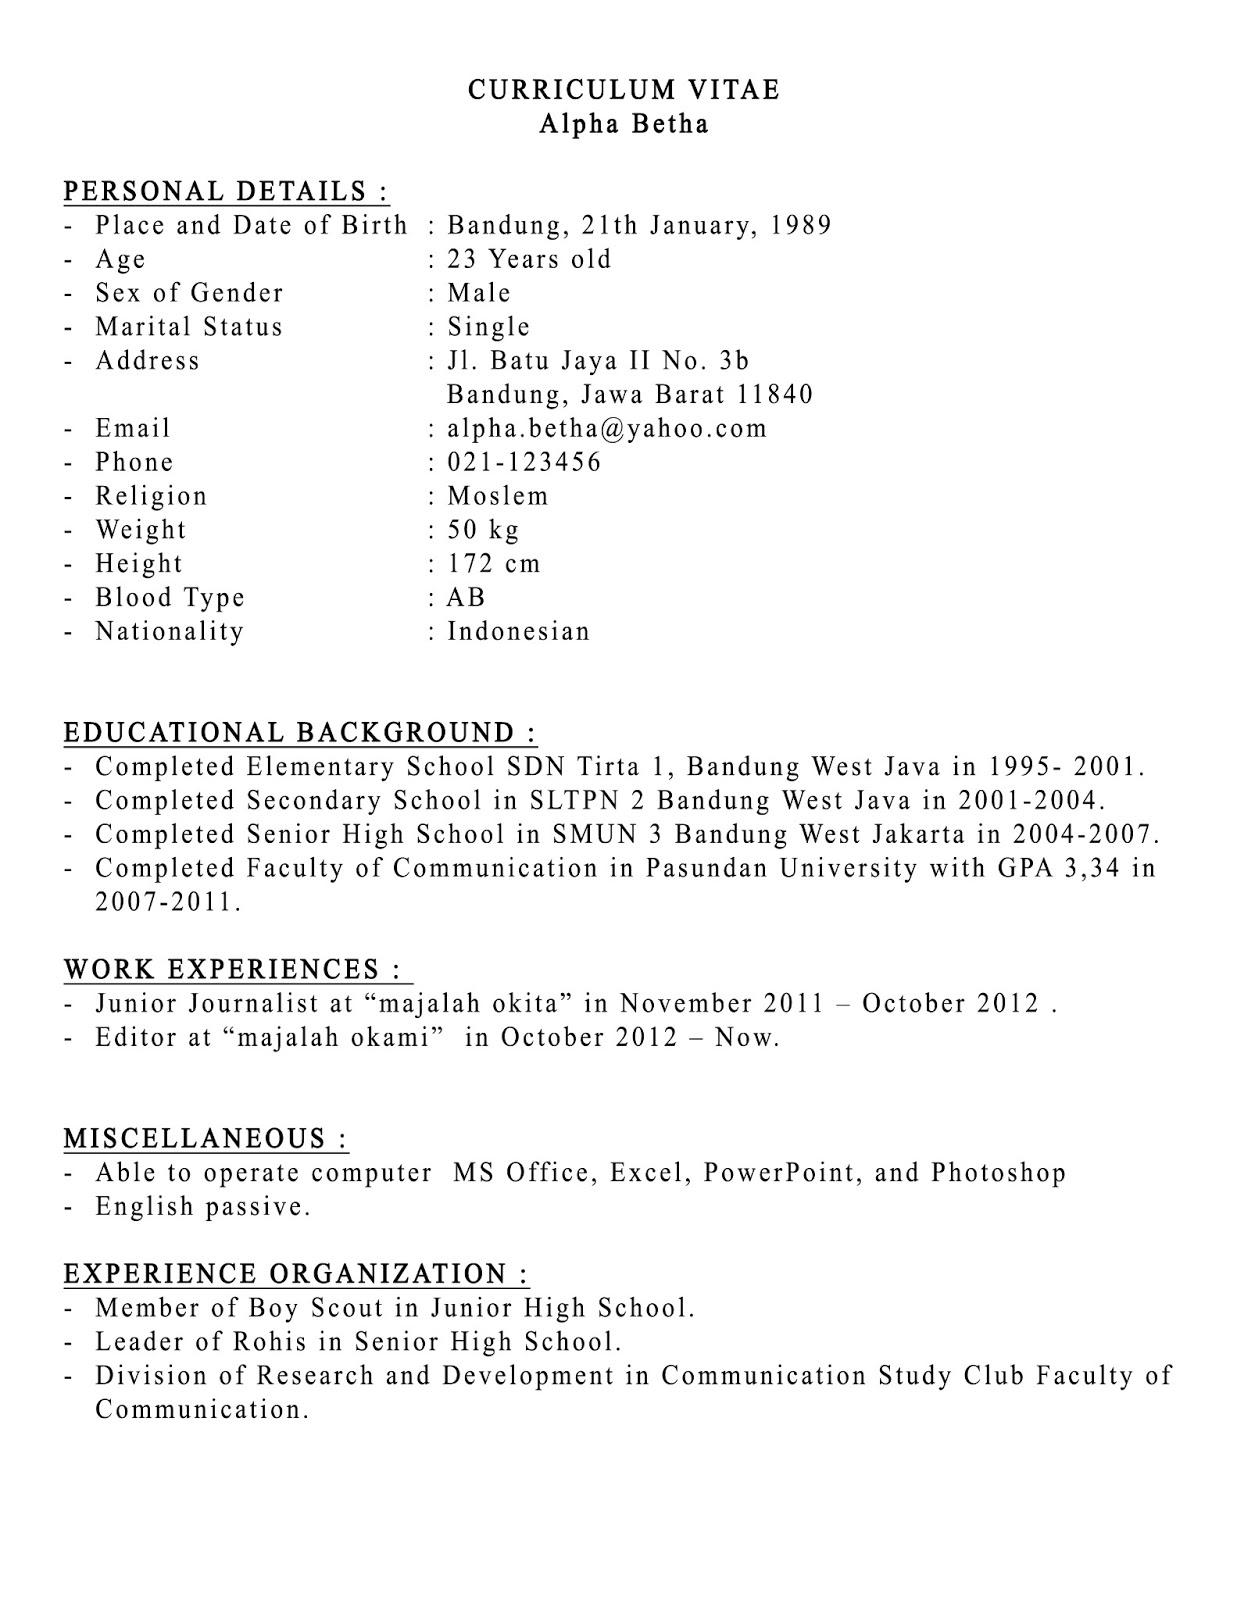 Contoh Curriculum Vitae Dengan Bahasa Inggris Cv Nabila